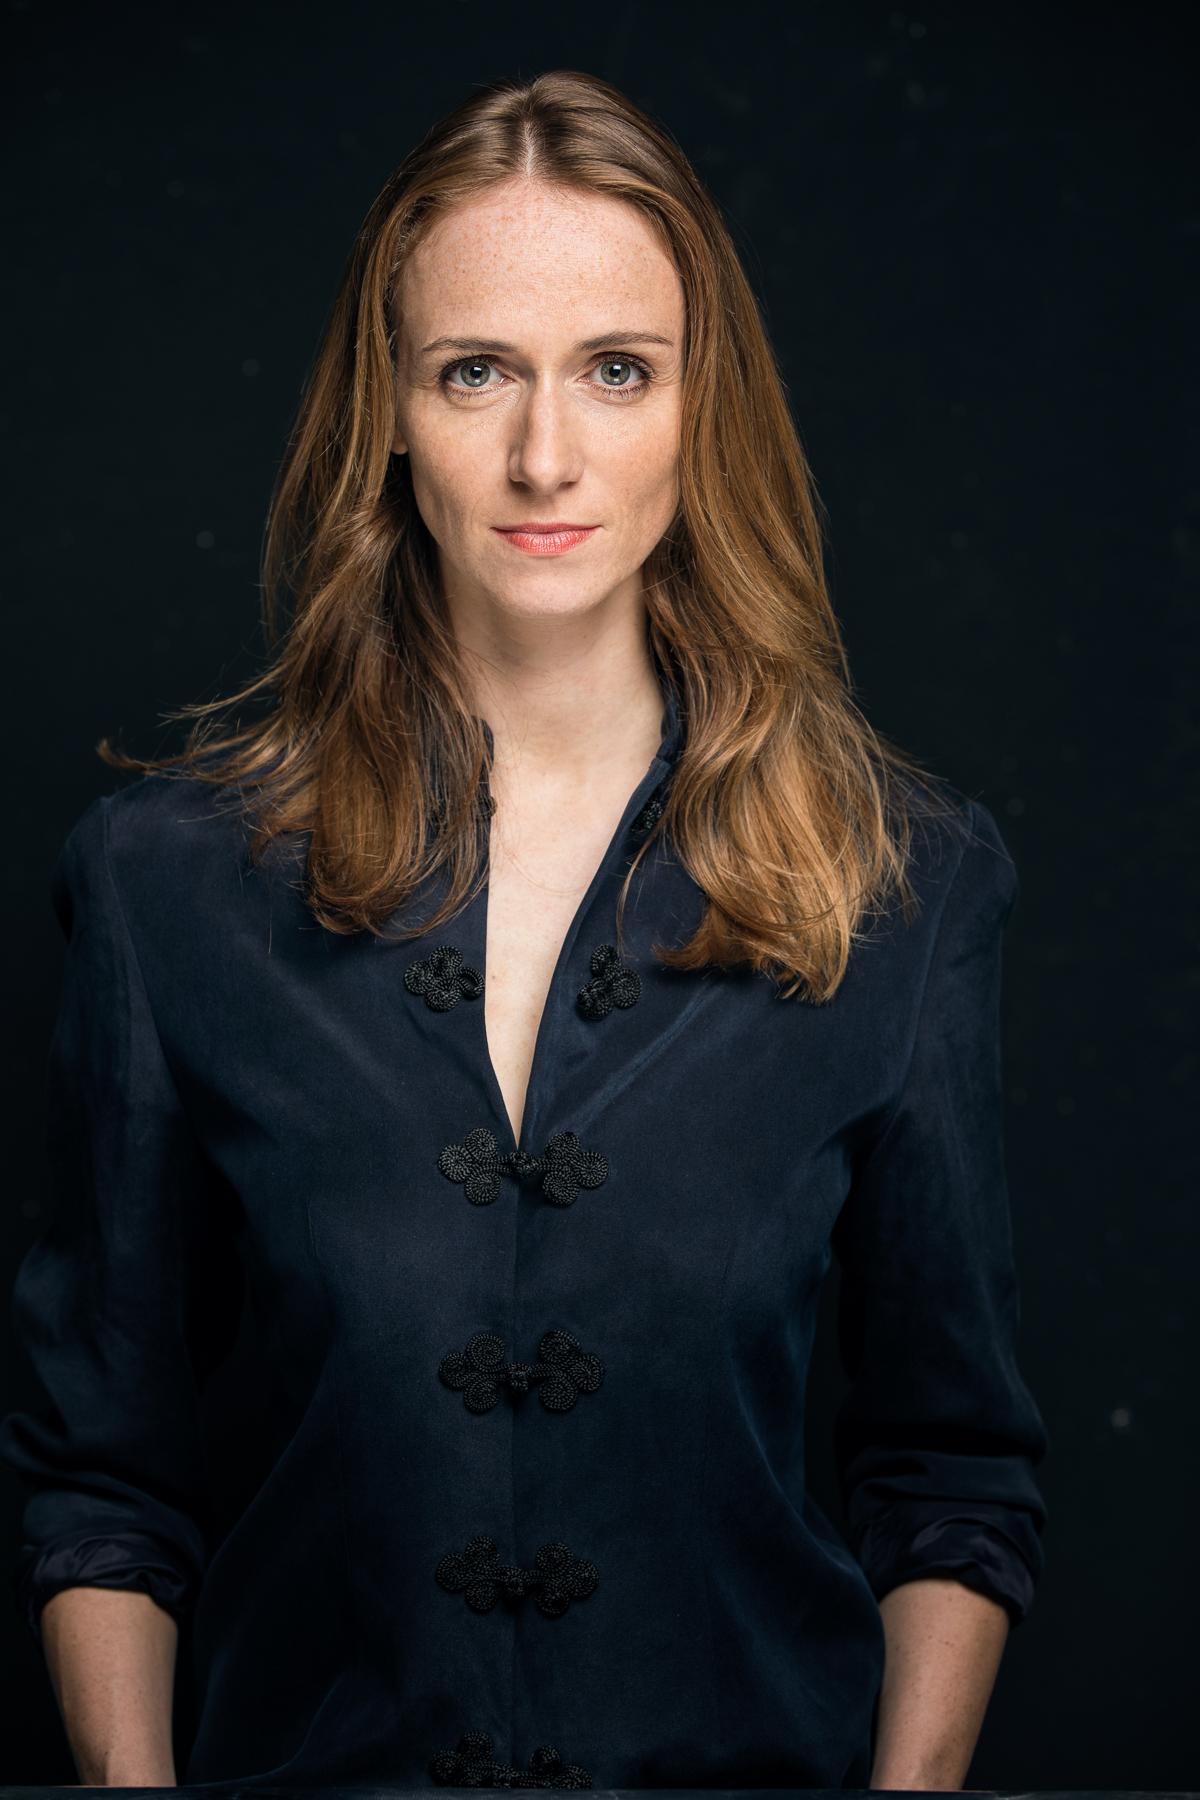 Simone-Kern-072017-10-web.JPG